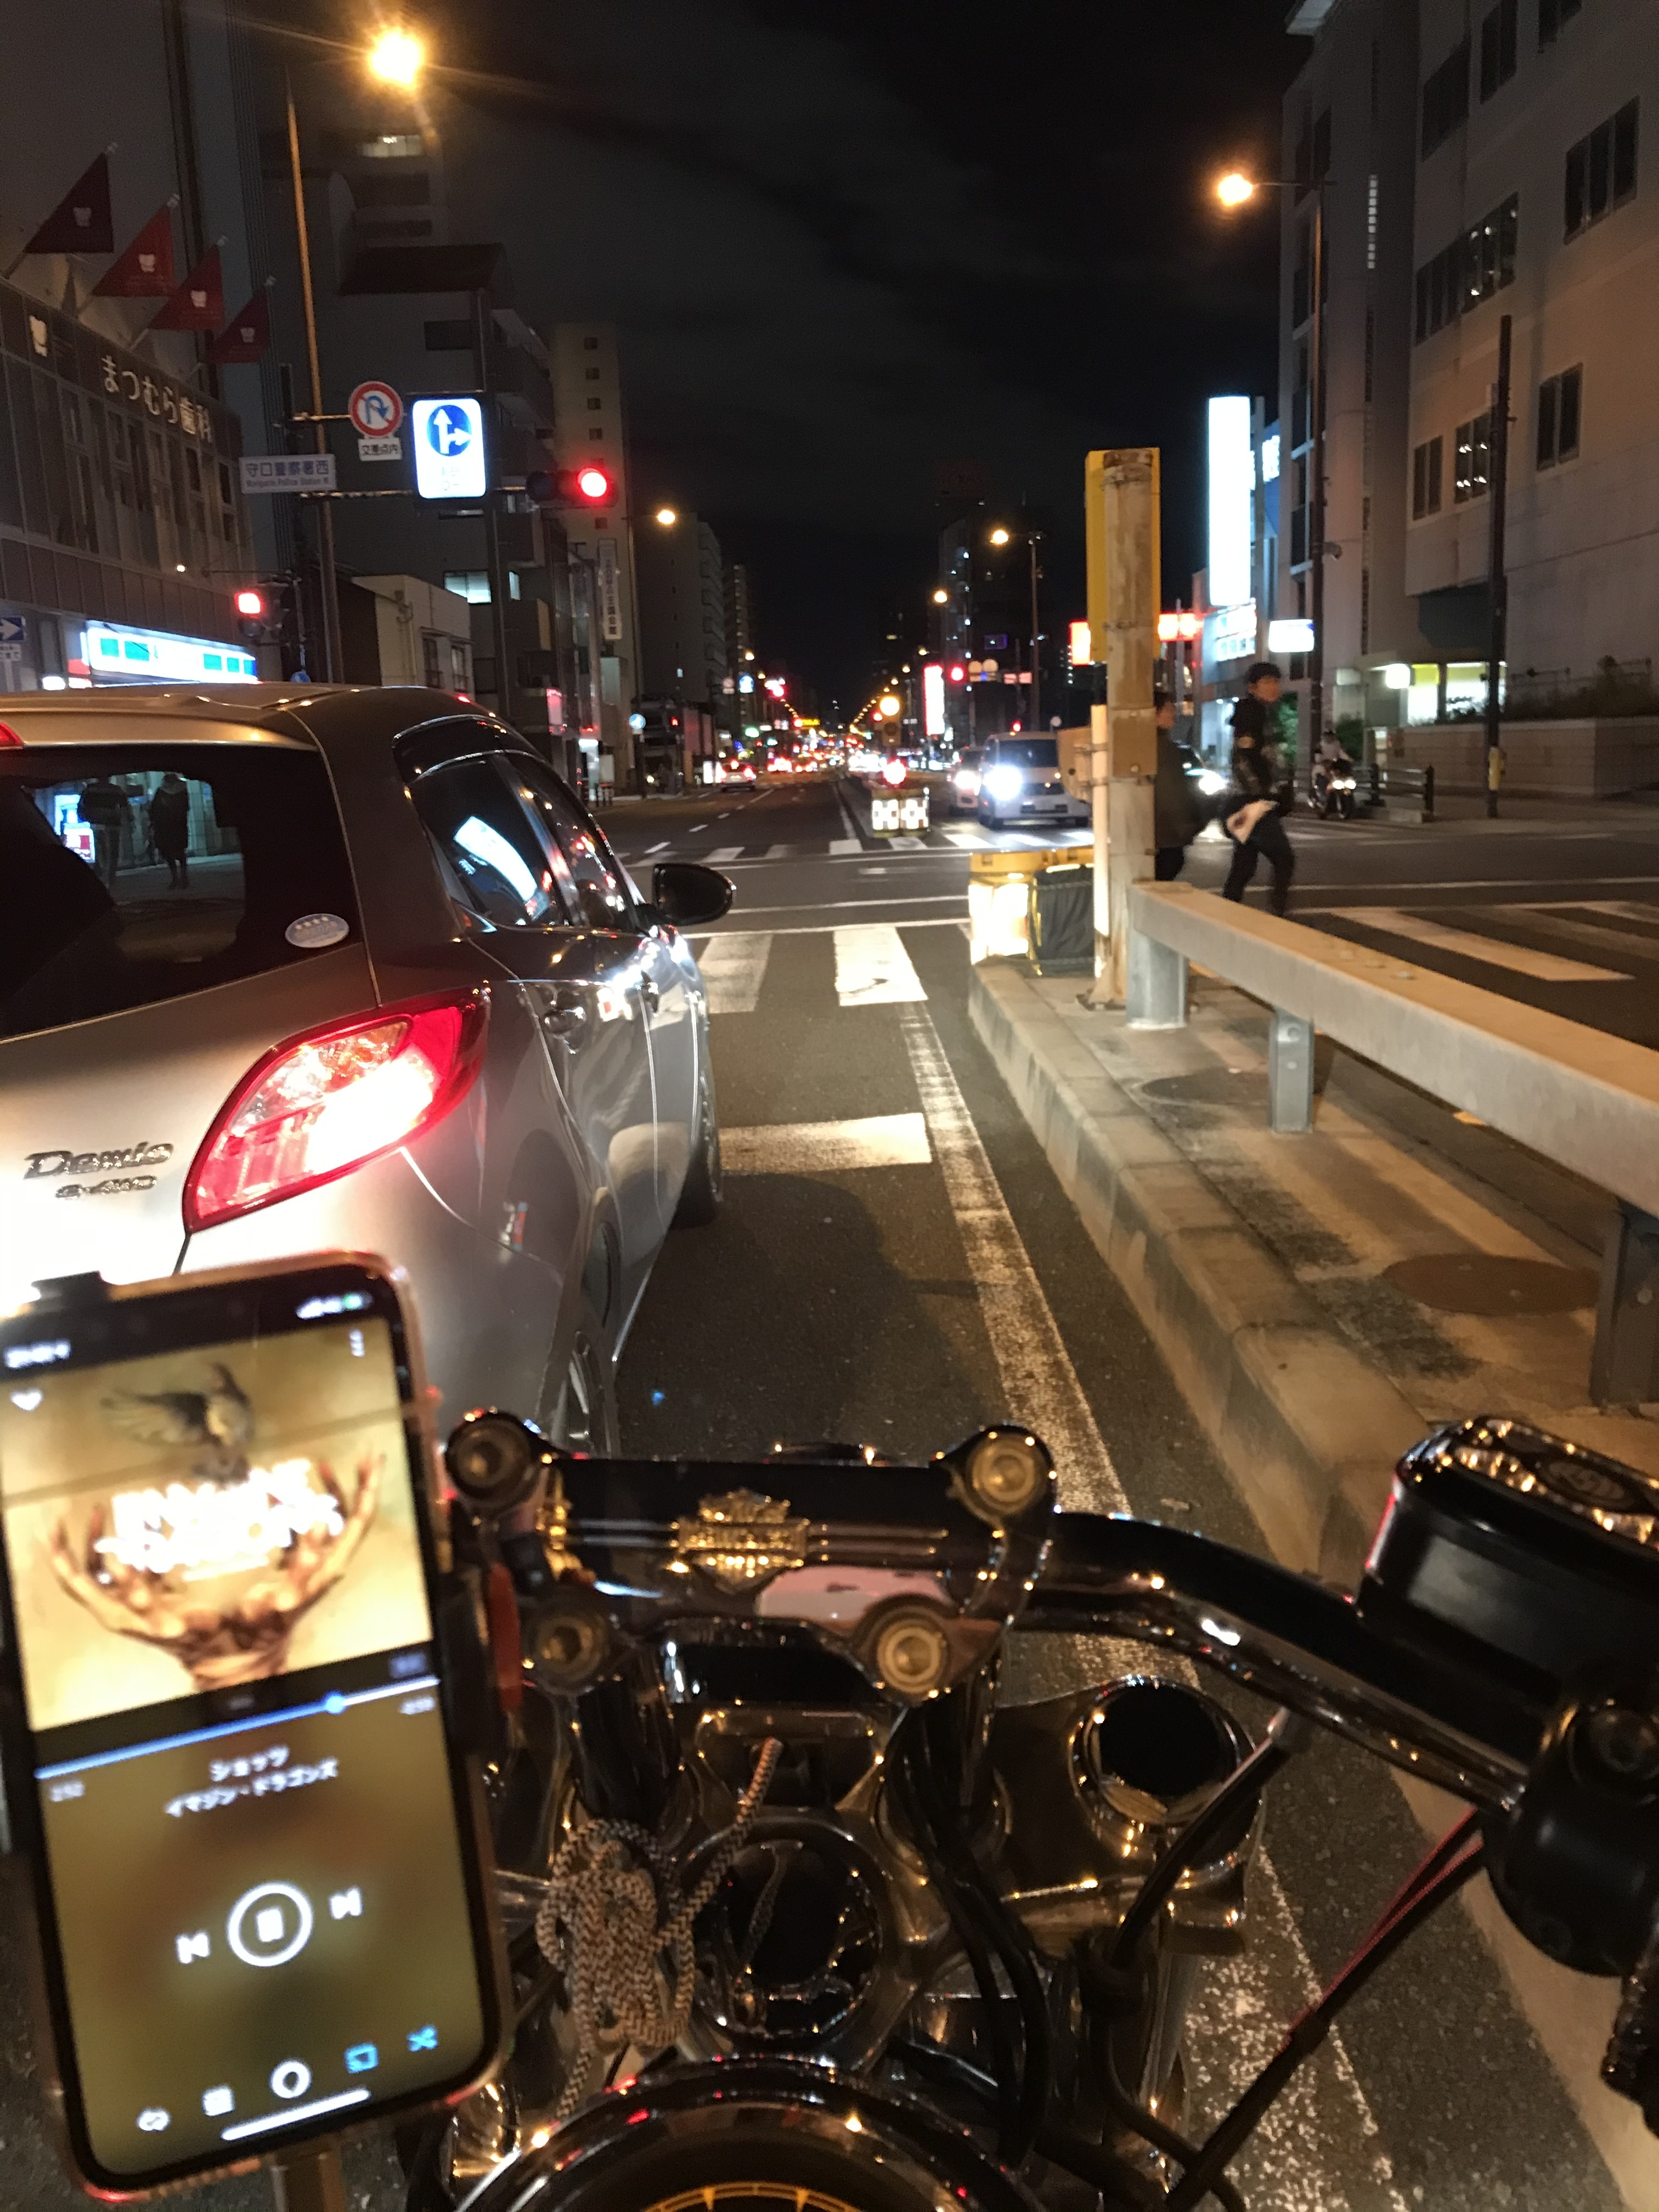 harleydavidson-motorcycle-touring-blog-osaka-nightouringt.jpg